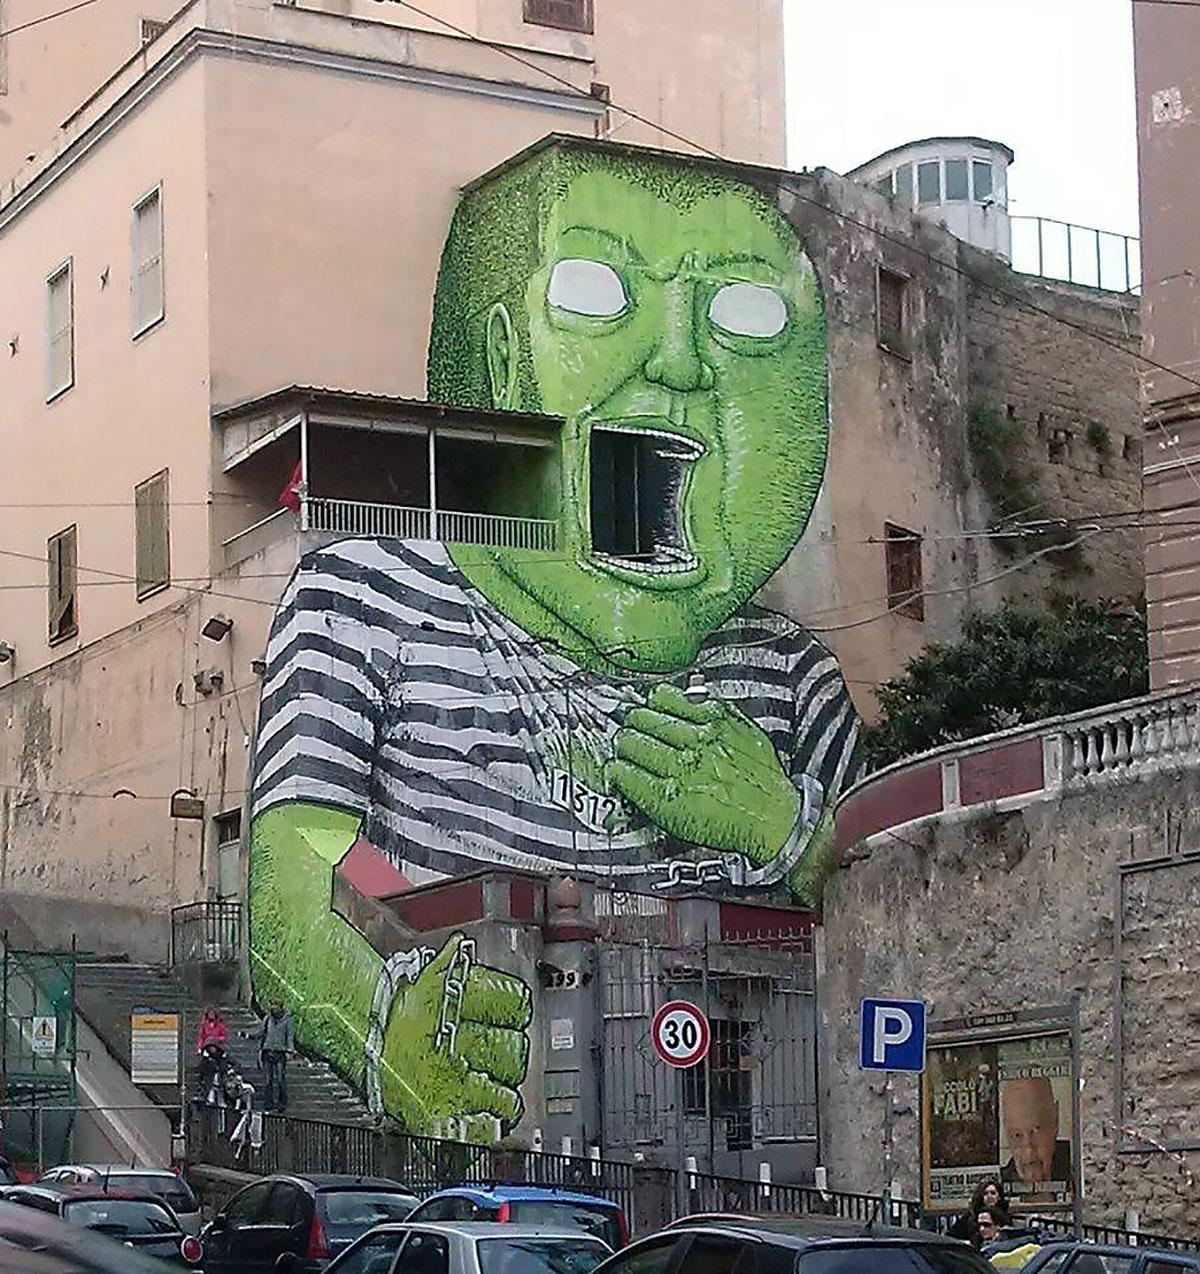 street-art-gigante-verde-napoli-detenuto-ex-carcere-blu-5